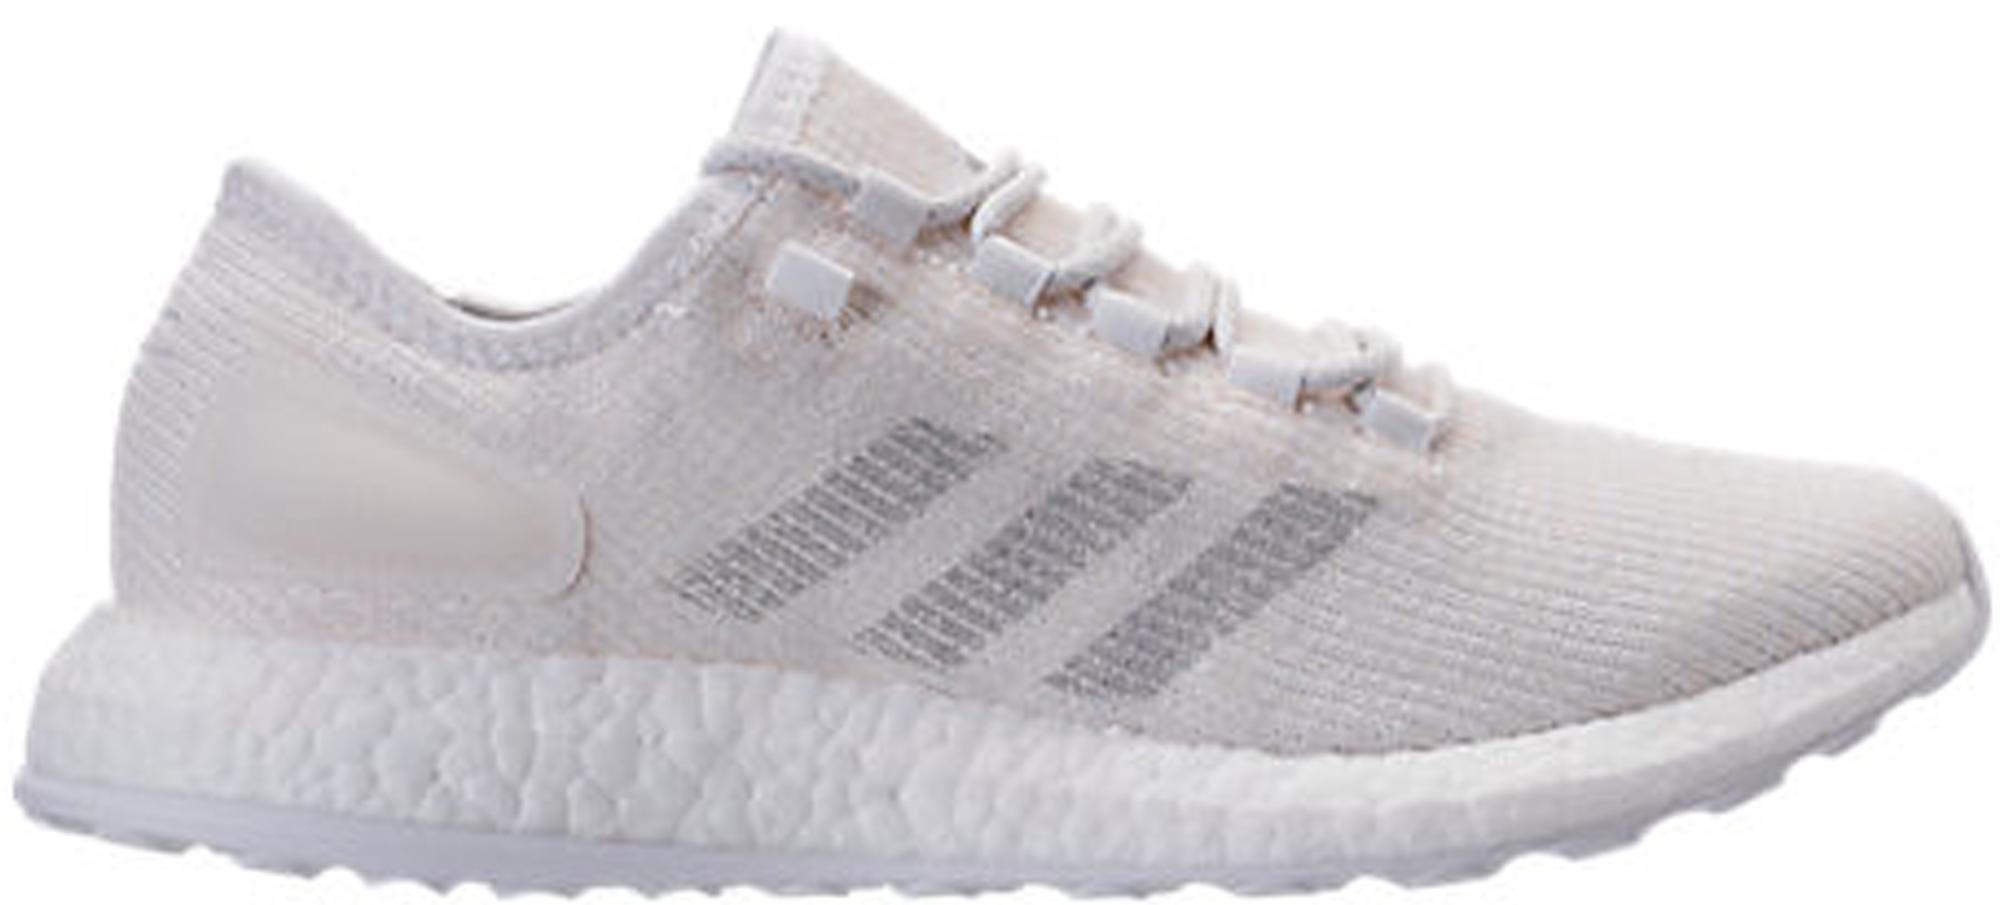 adidas Pureboost Clima White - BA9058